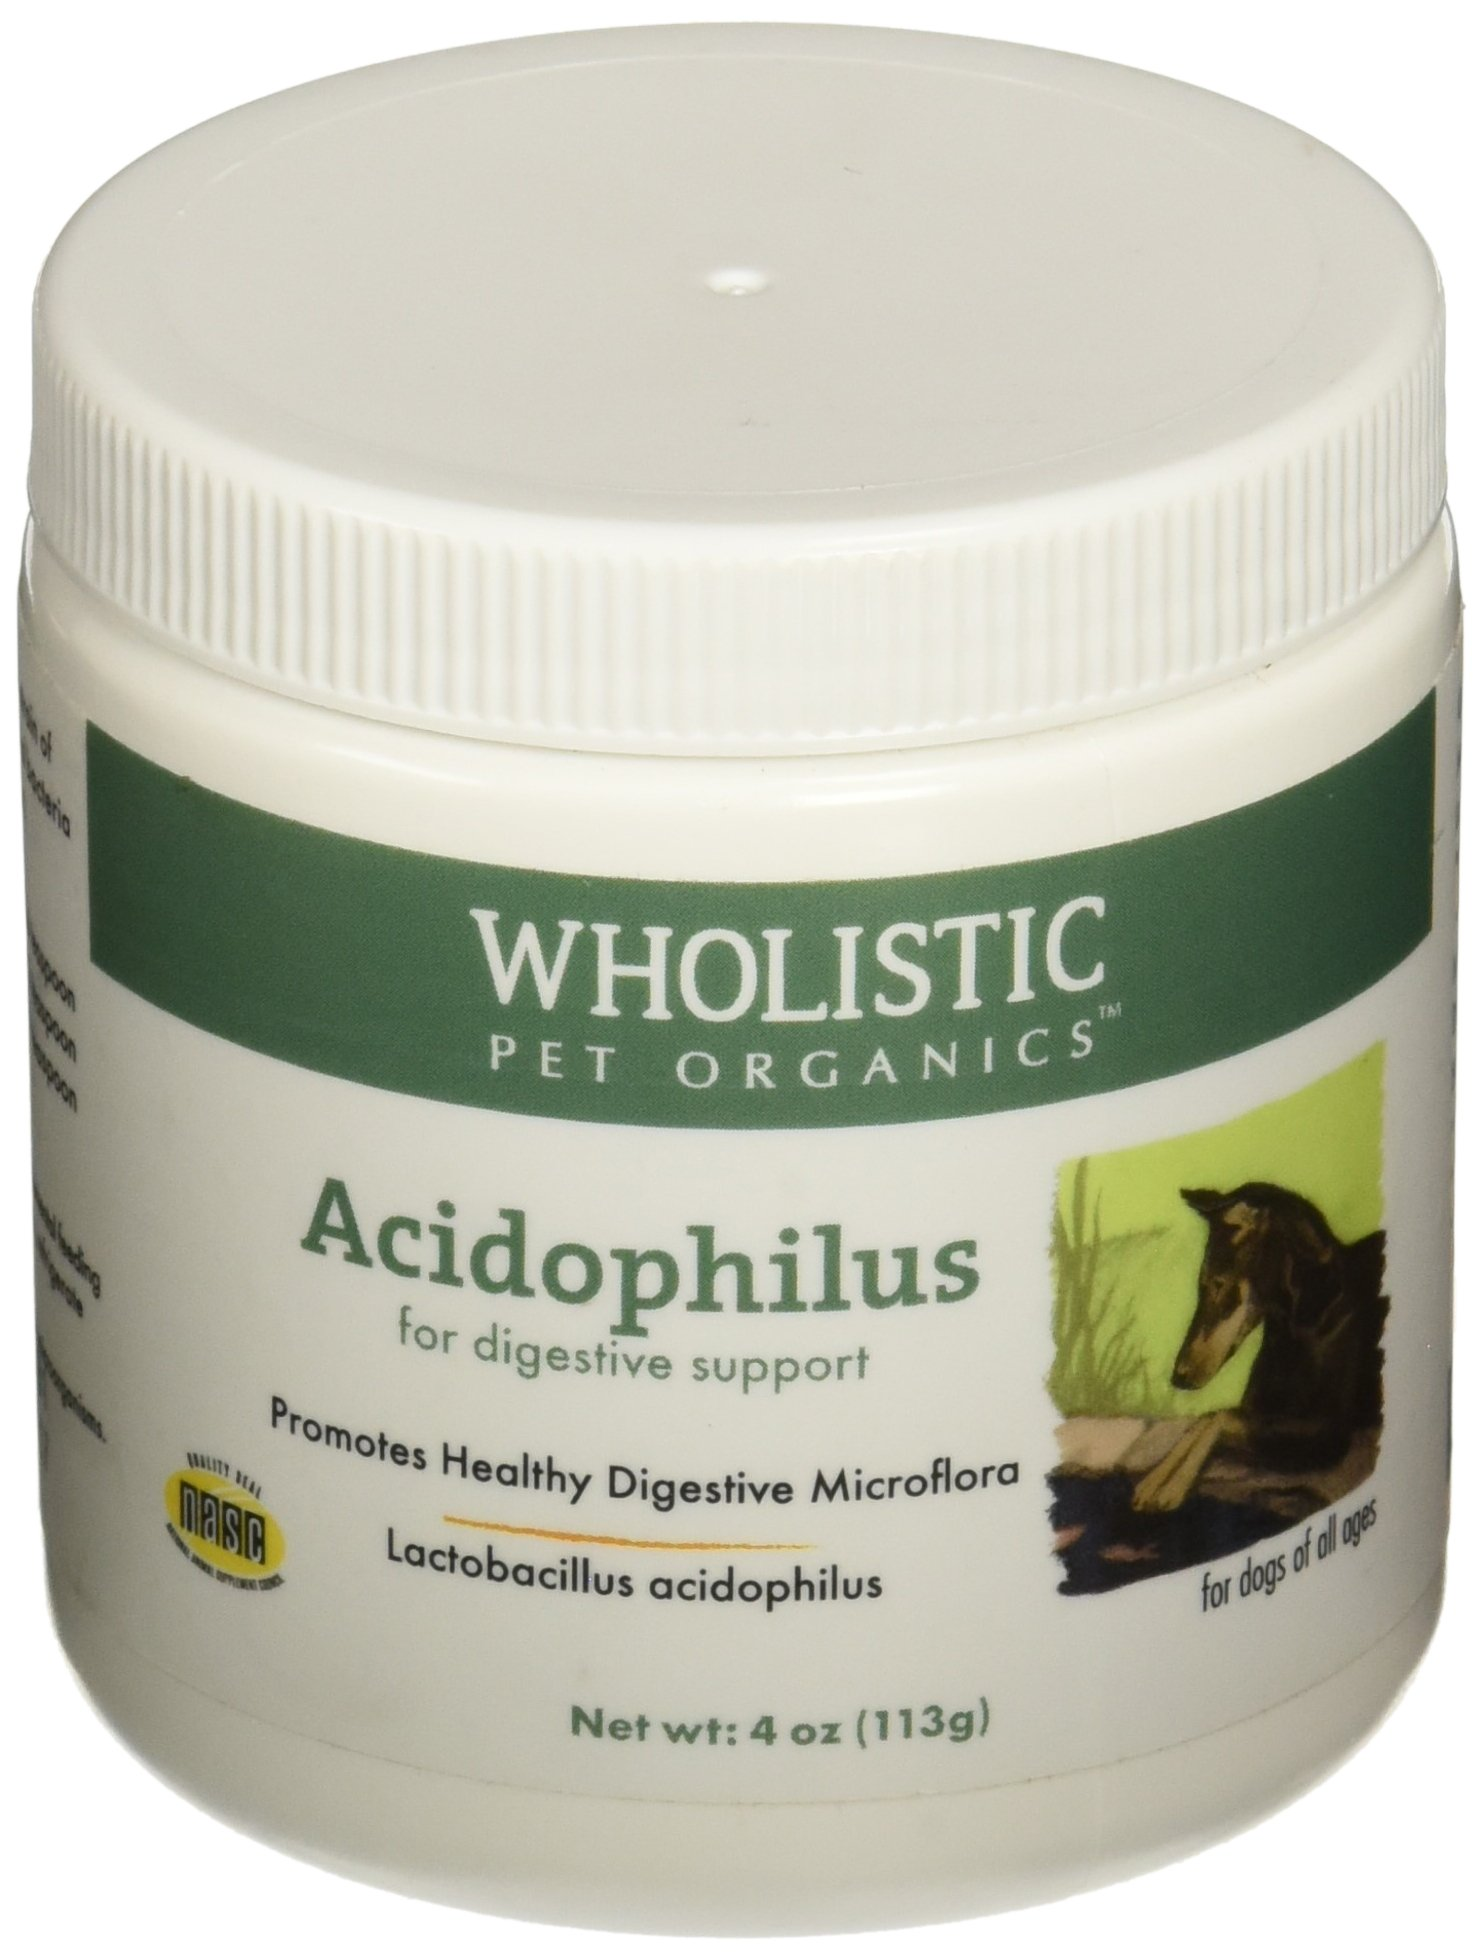 Wholistic Pet Acidophilus 4oz Natural and Organic Probiotic Supplement